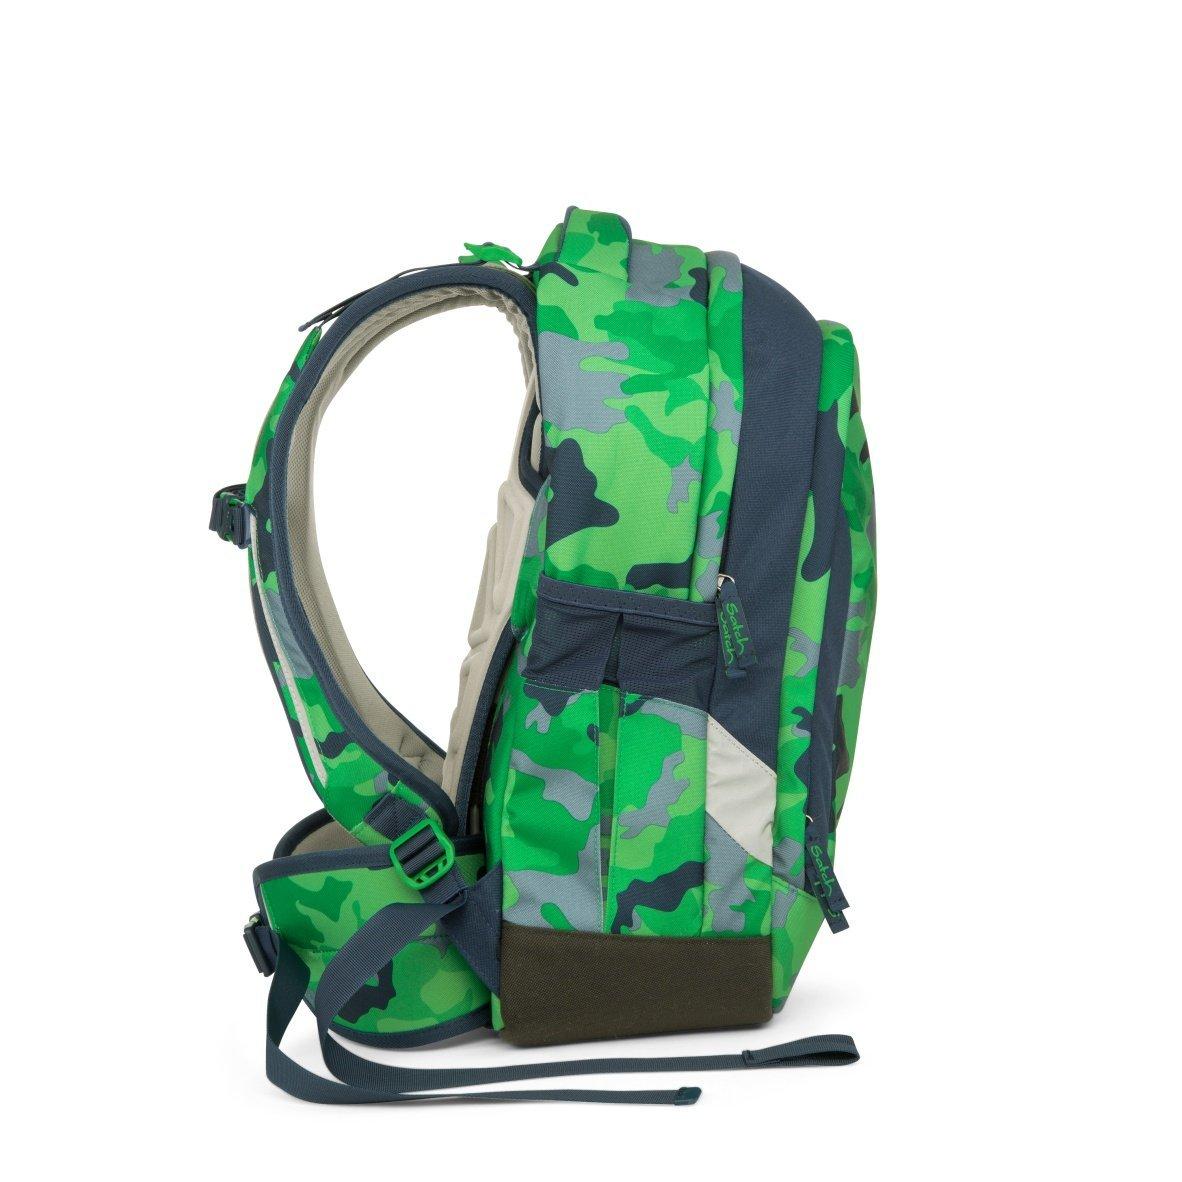 Рюкзак Ergobag Satch Sleek цвет Green Camou, - фото 7